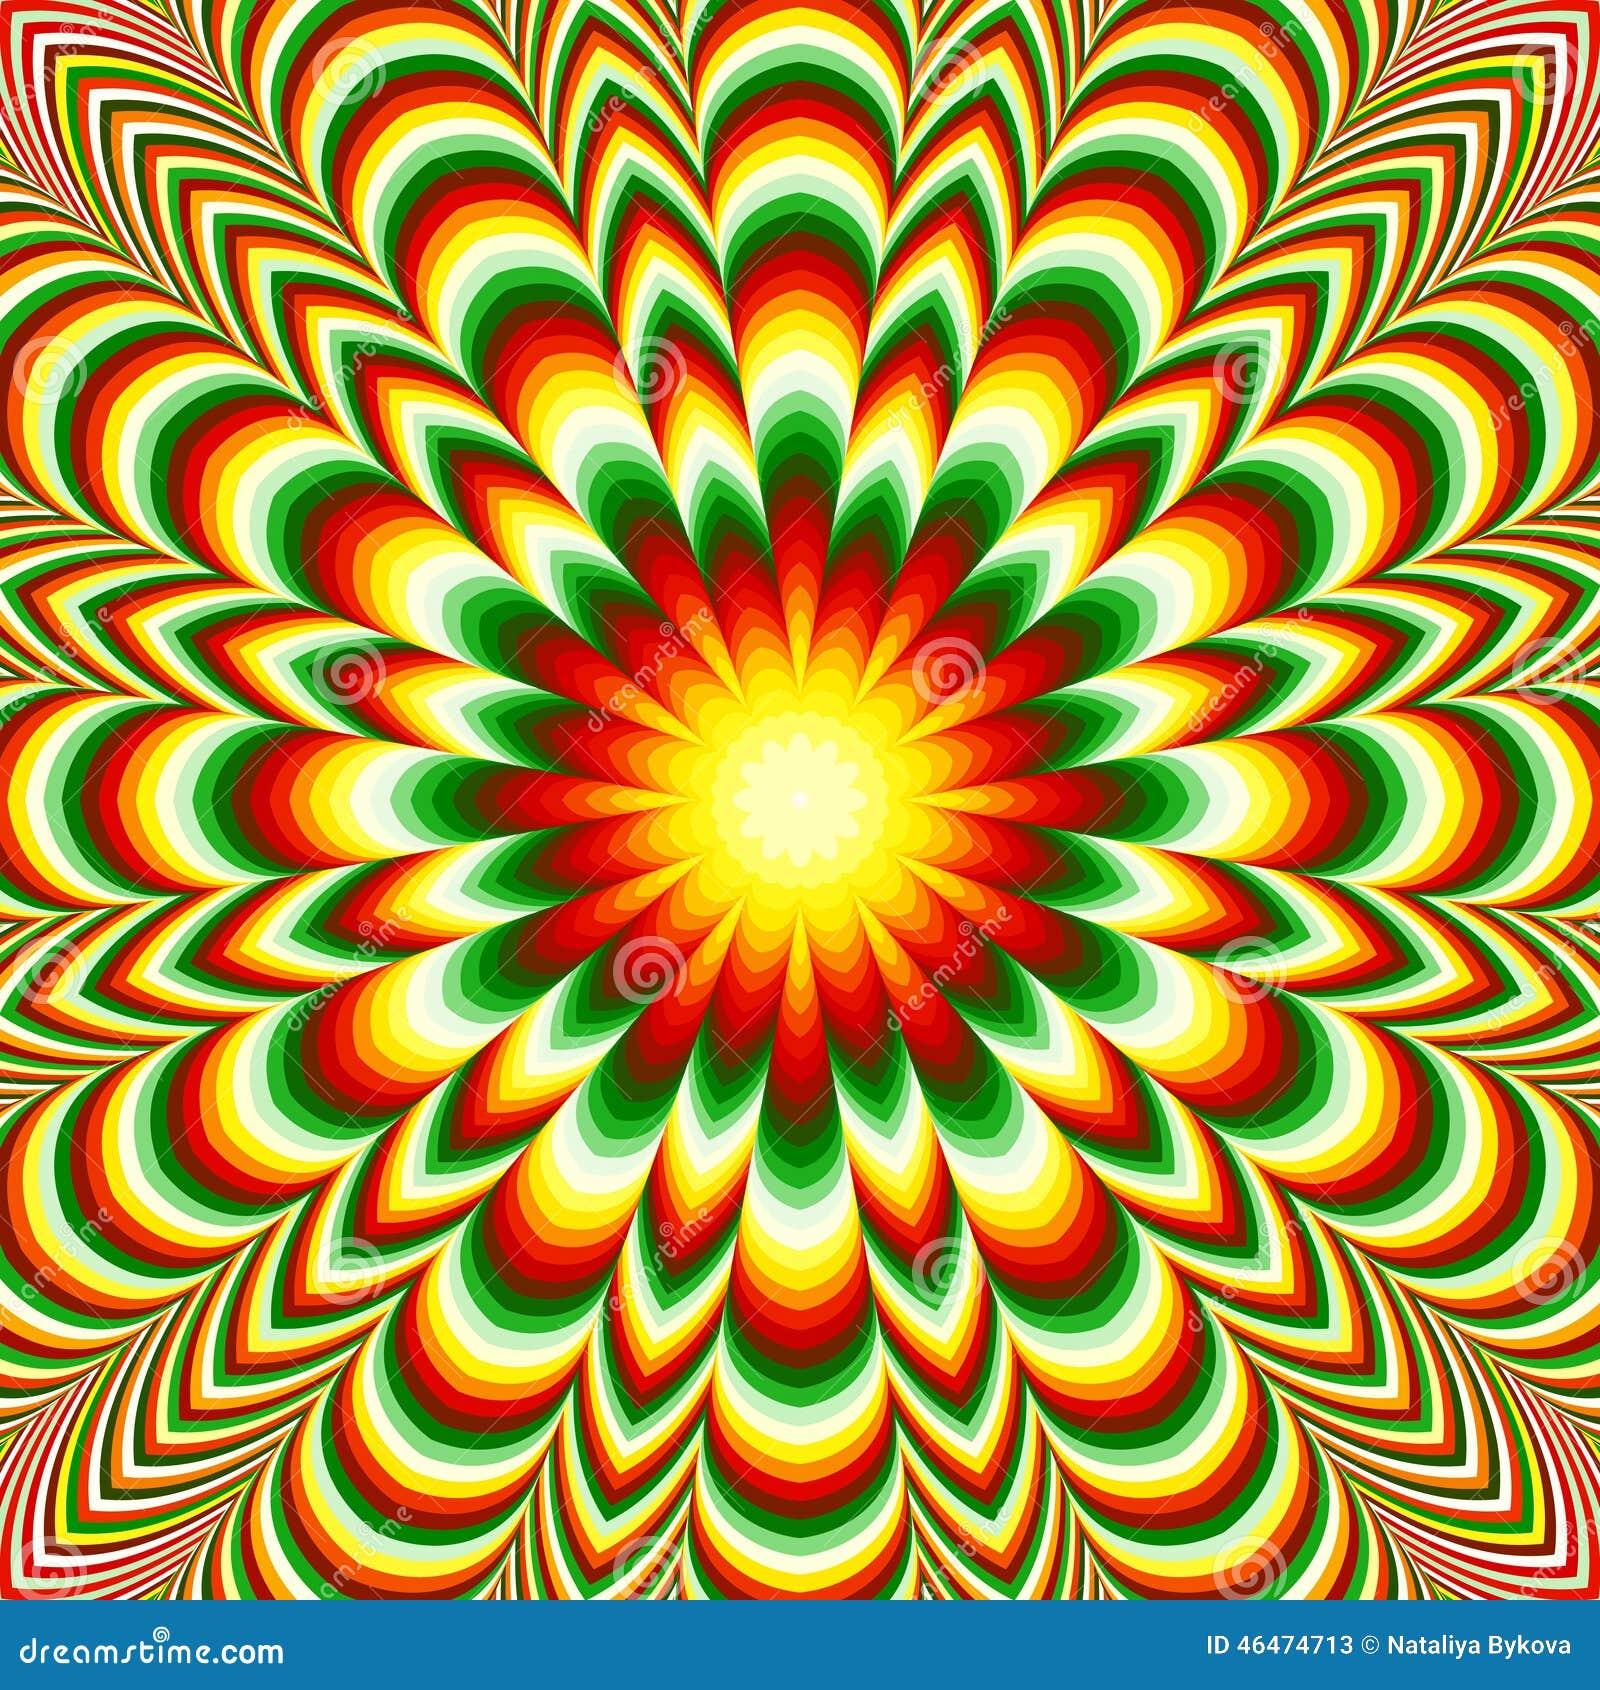 Mandala vif de fleur avec l 39 effet d 39 illusion optique for Effet d optique 3d